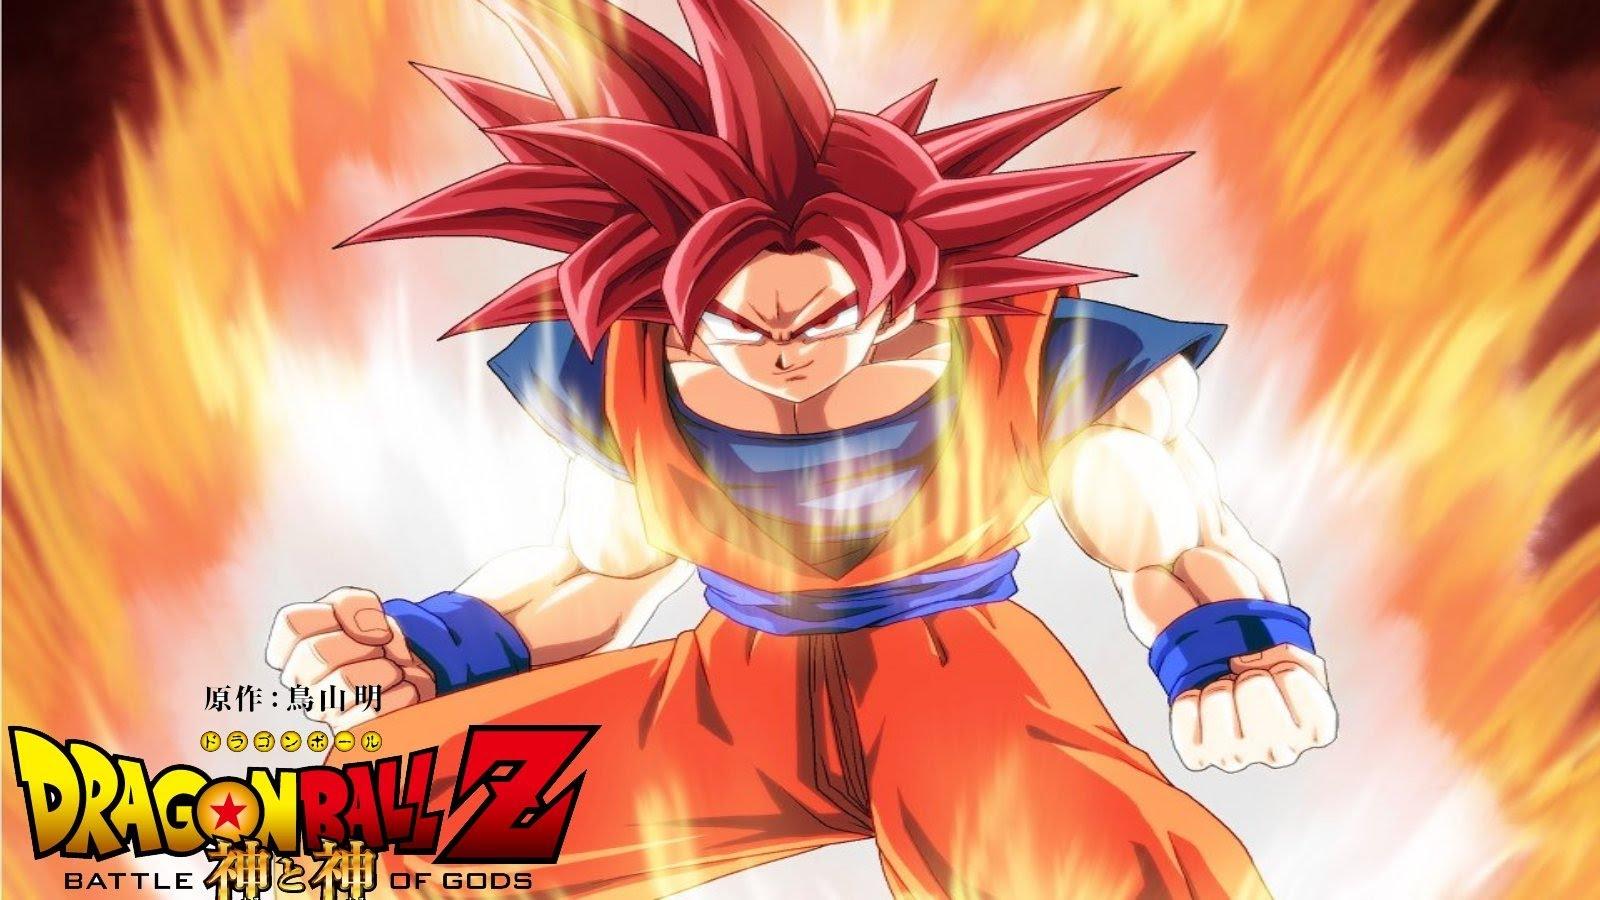 Free Download Dragon Ball Goku Super Saiyan God Wallpaper